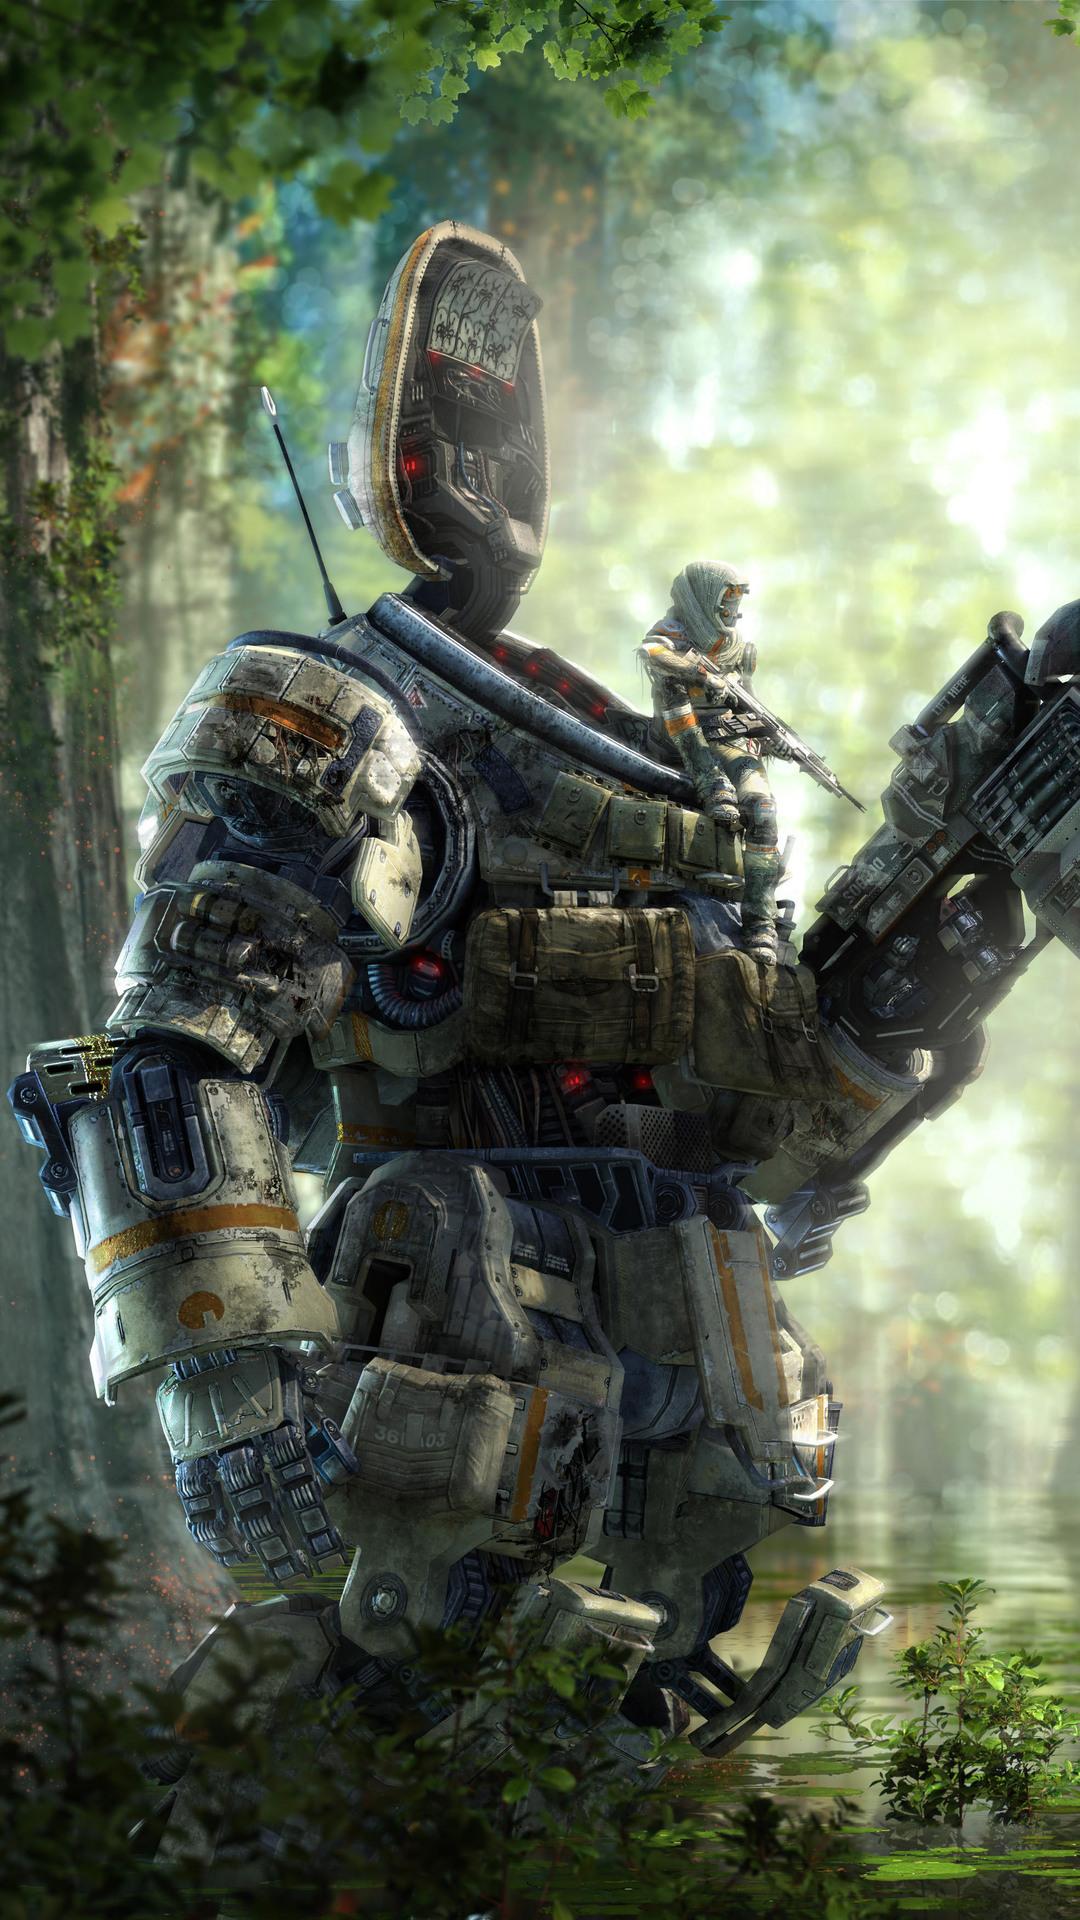 titanfall-2-artwork-5k-ad.jpg